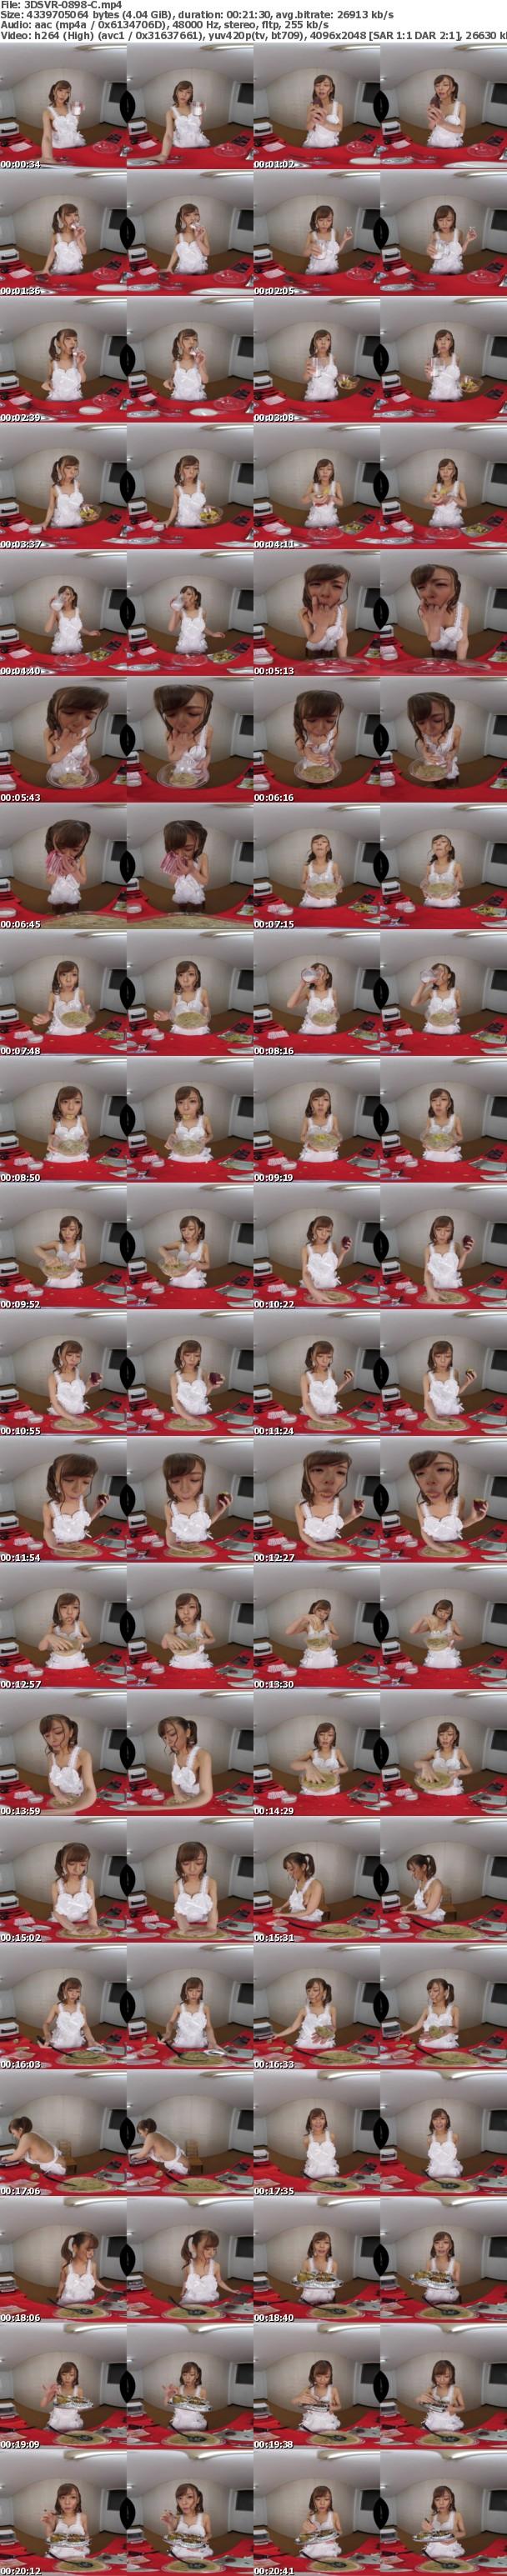 (VR) 3DSVR-0898 【 祝!岬あずさ初嘔吐作】ゲロまみれSEX VR~唾液よりも1000倍快感!吐瀉物まみれのフェラ・手コキ・SEX